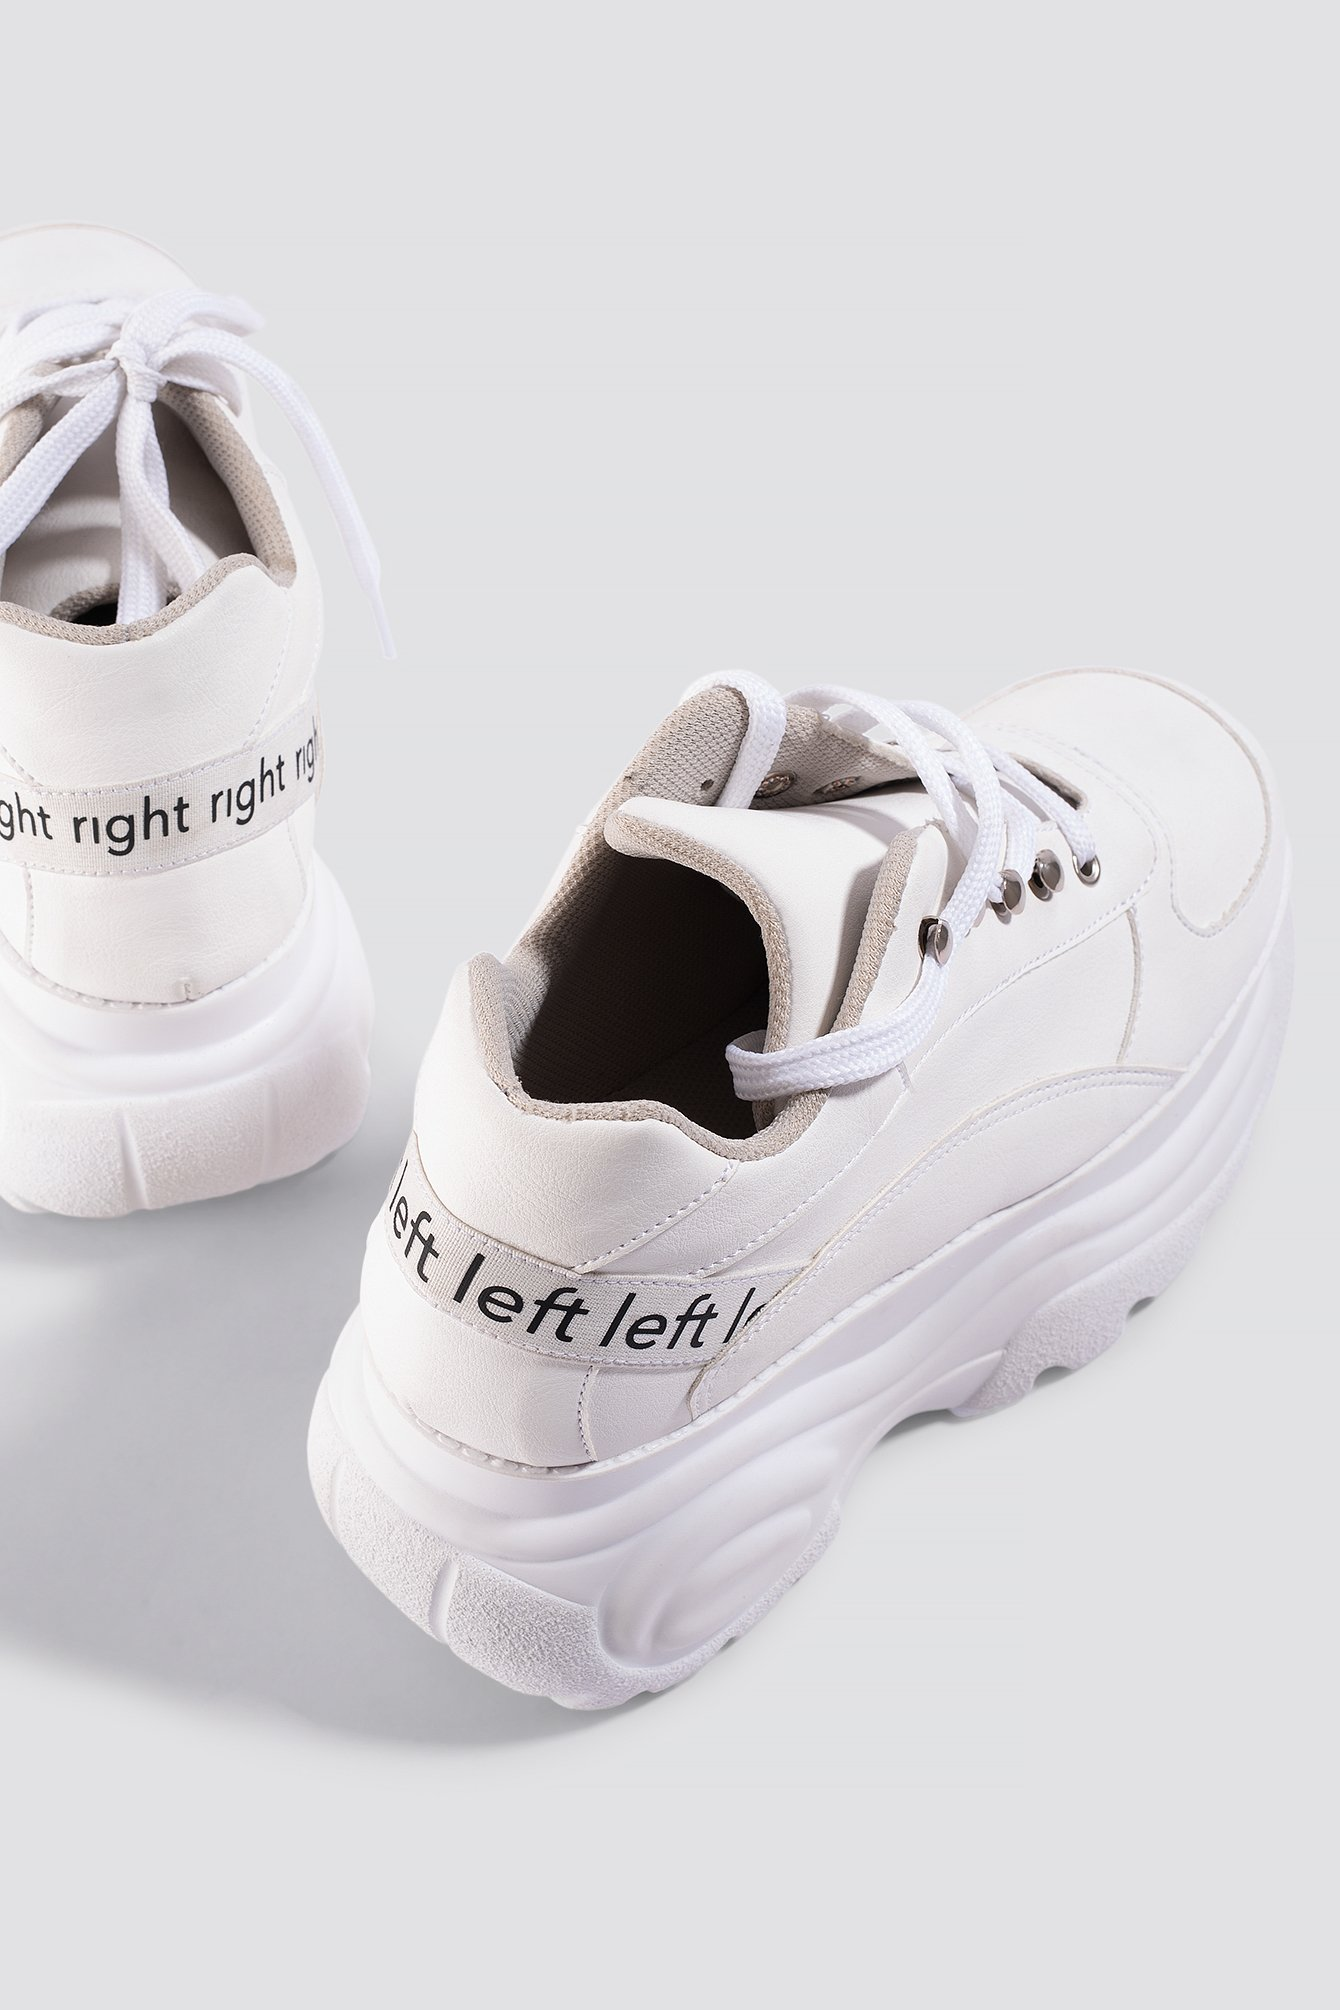 ASTRID OLSEN X NA-KD Platform Sneaker - White